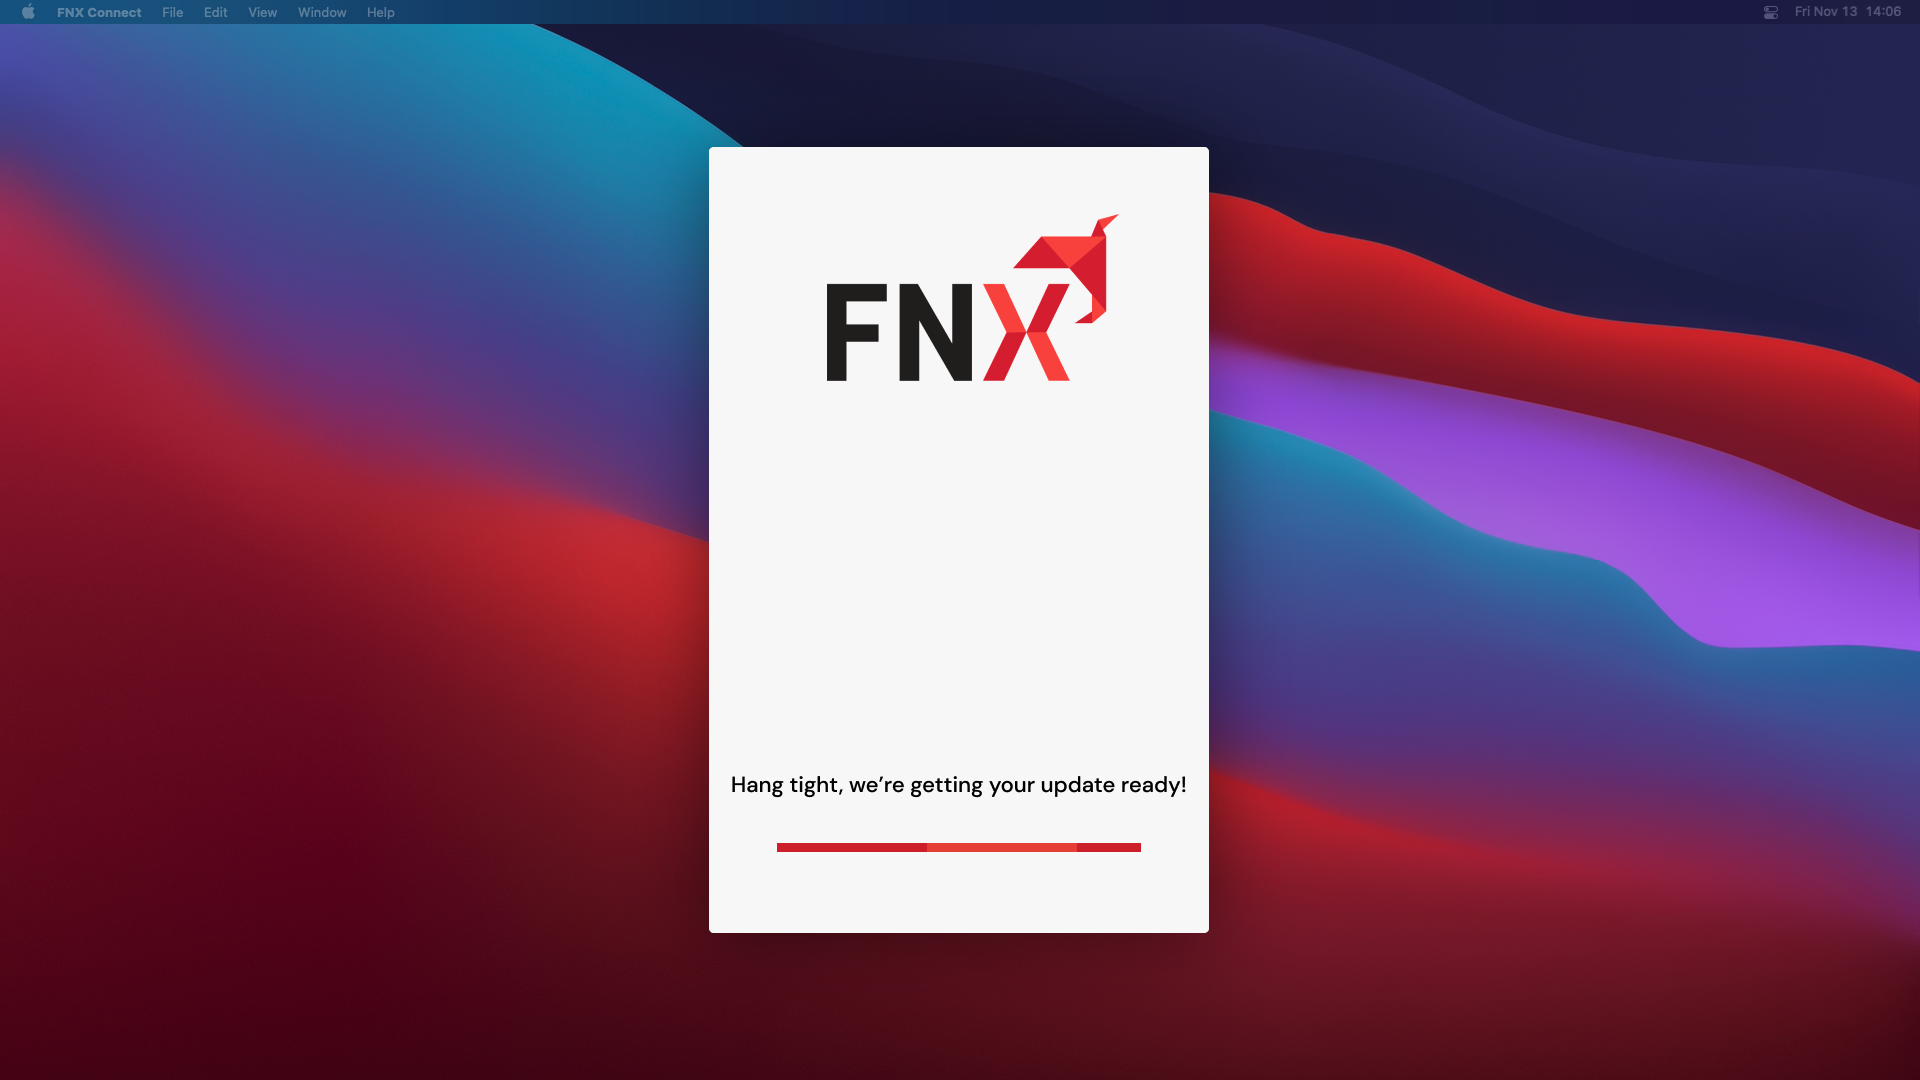 FNX Connect Splash Image